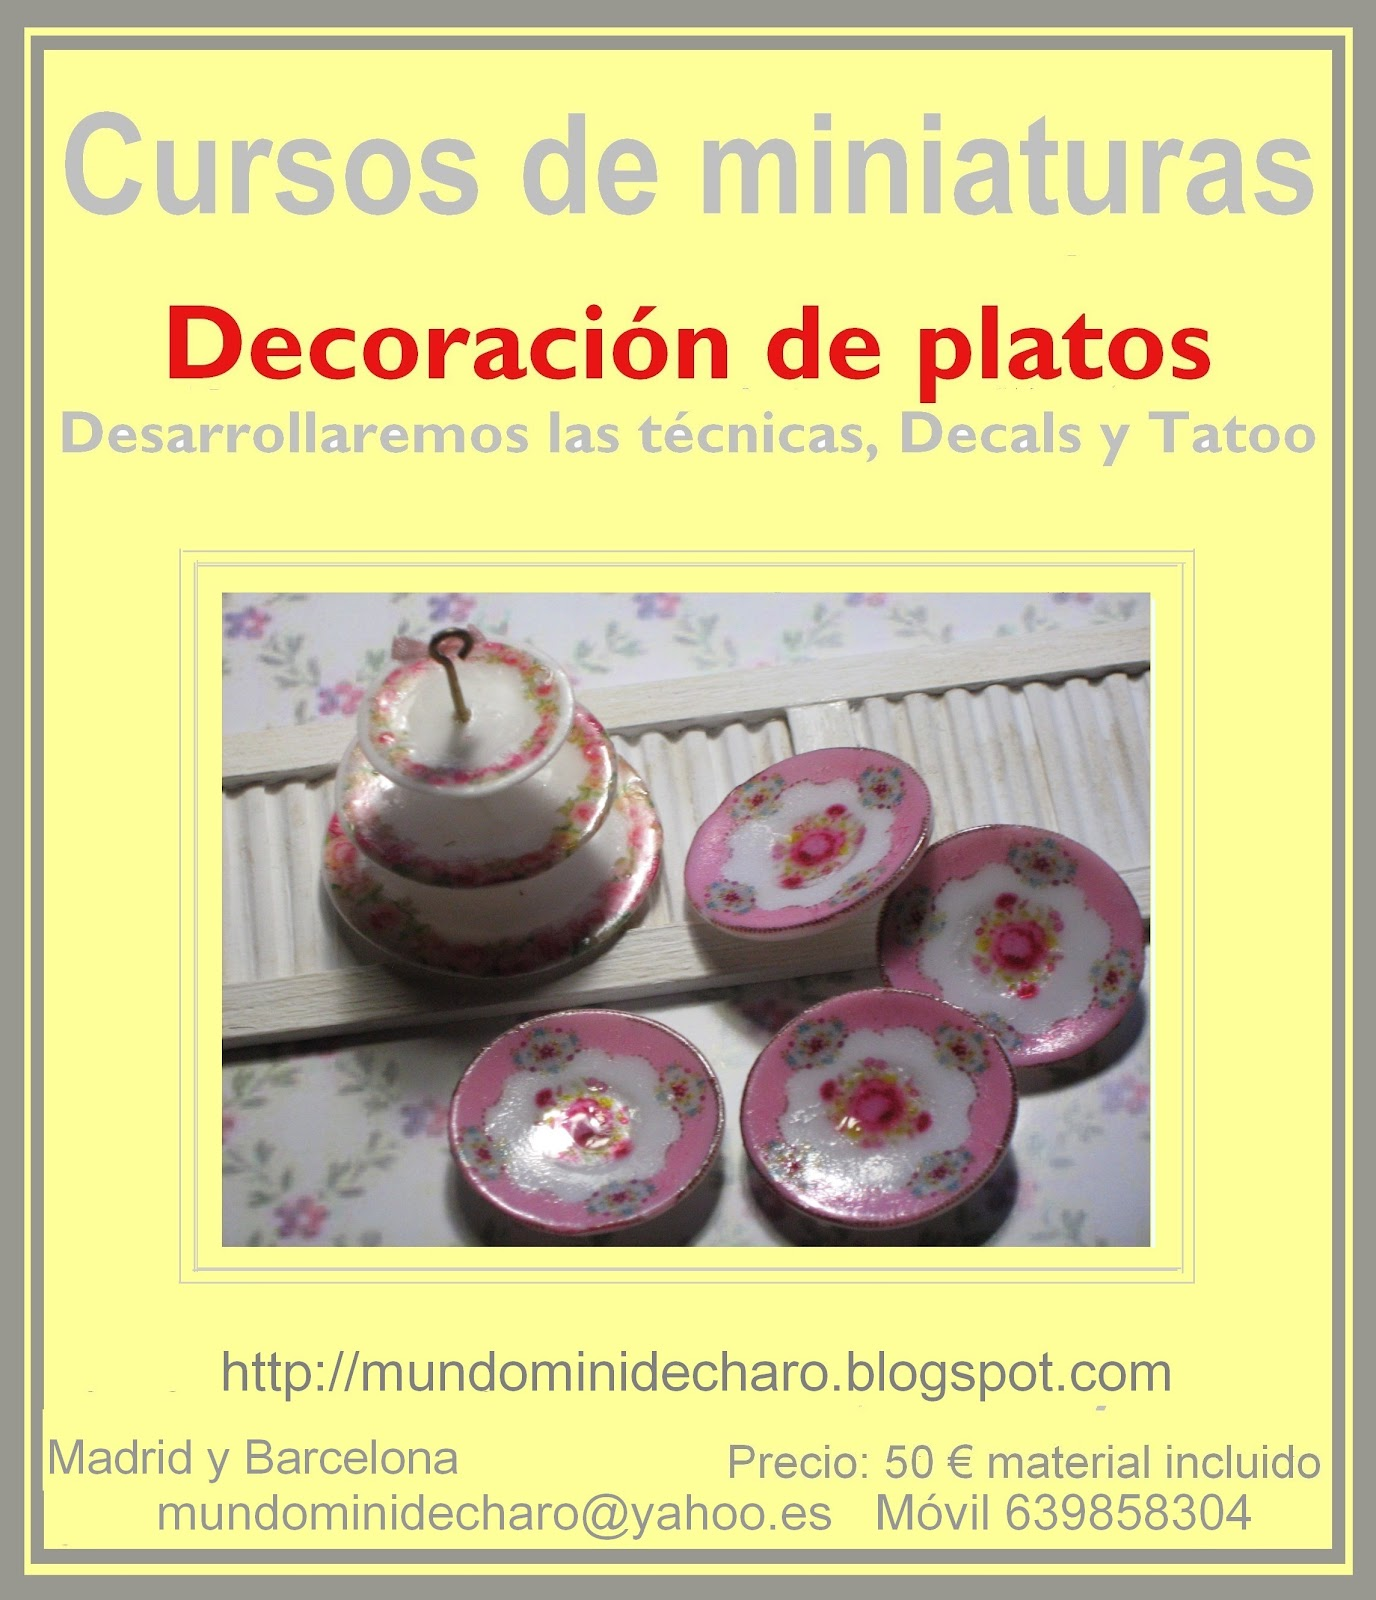 Mundomini decoraci n de platos talleres - Decoracion de platos ...